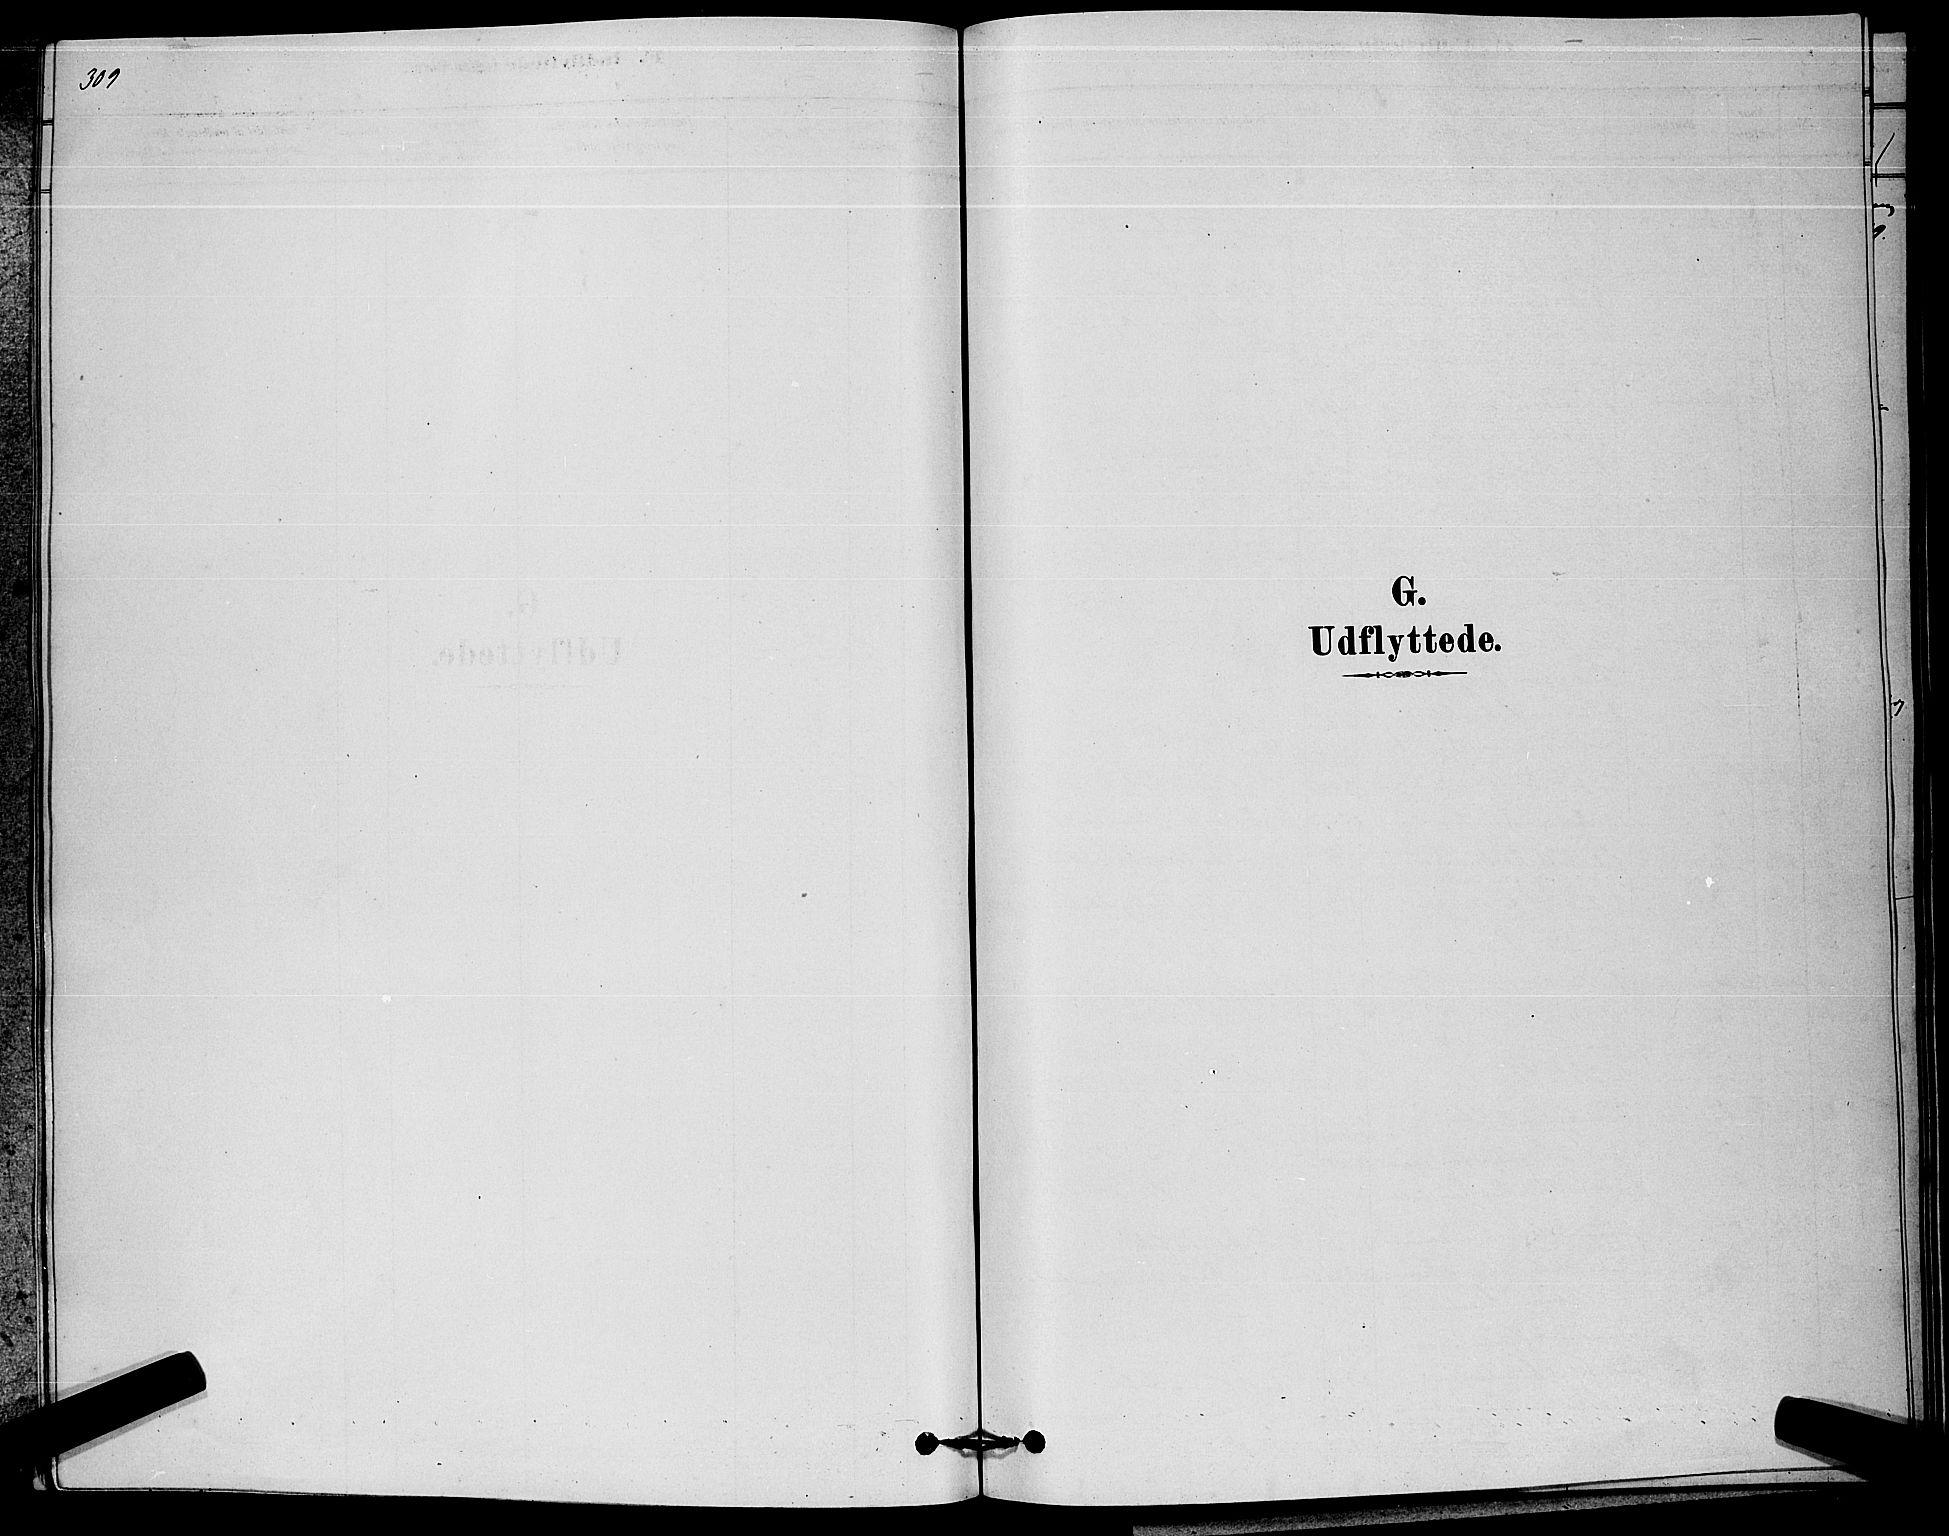 SAKO, Kongsberg kirkebøker, G/Ga/L0005: Parish register (copy) no. 5, 1878-1889, p. 309